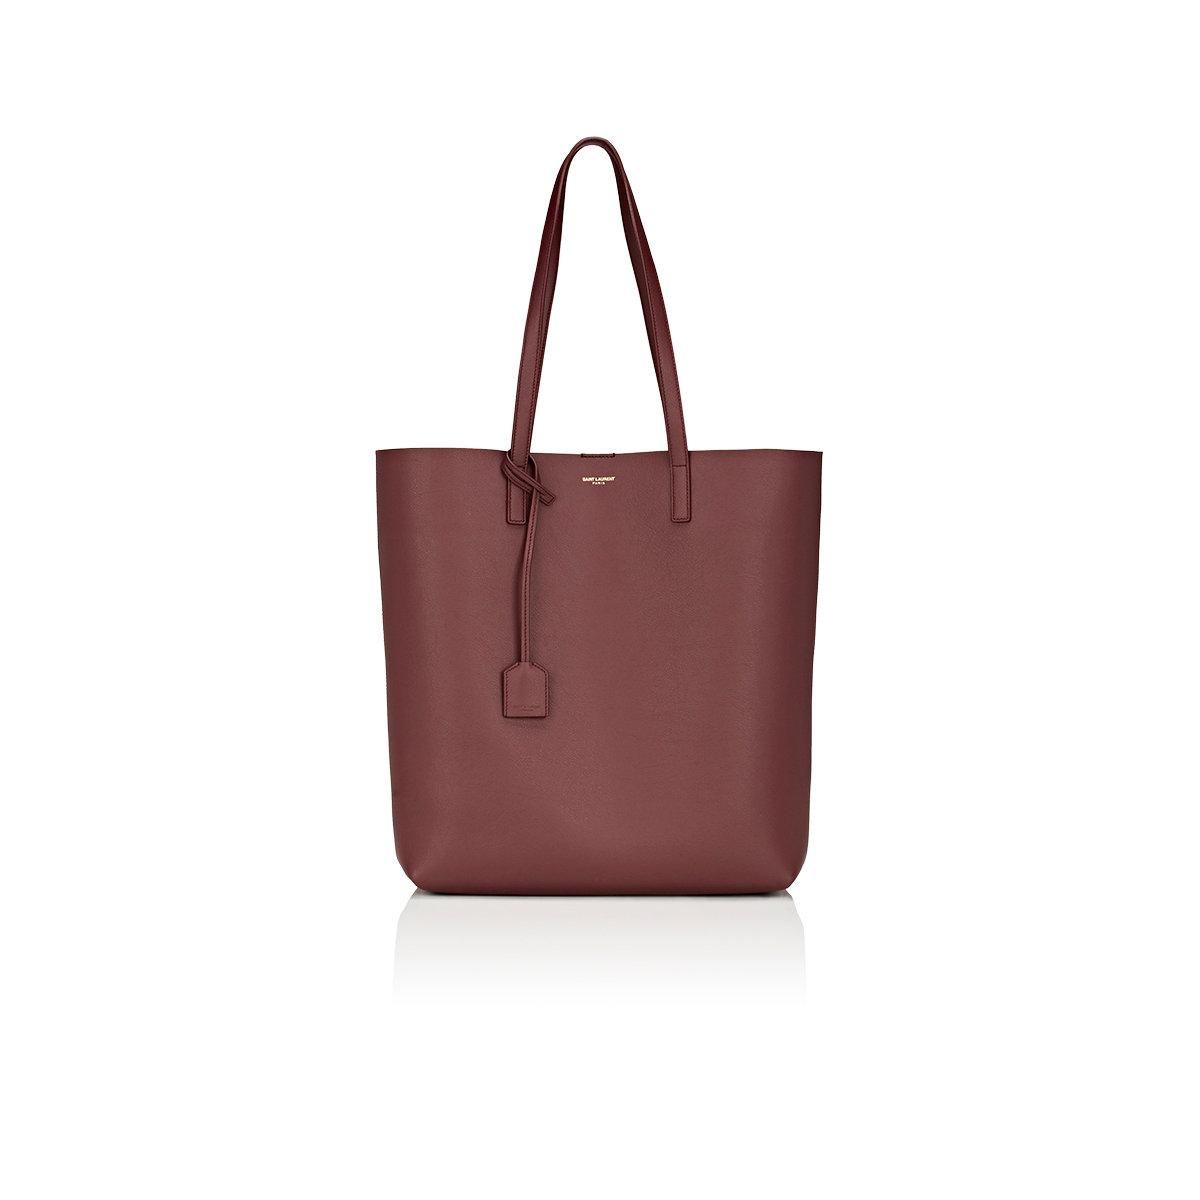 saint laurent medium shopping tote bag in red lyst. Black Bedroom Furniture Sets. Home Design Ideas